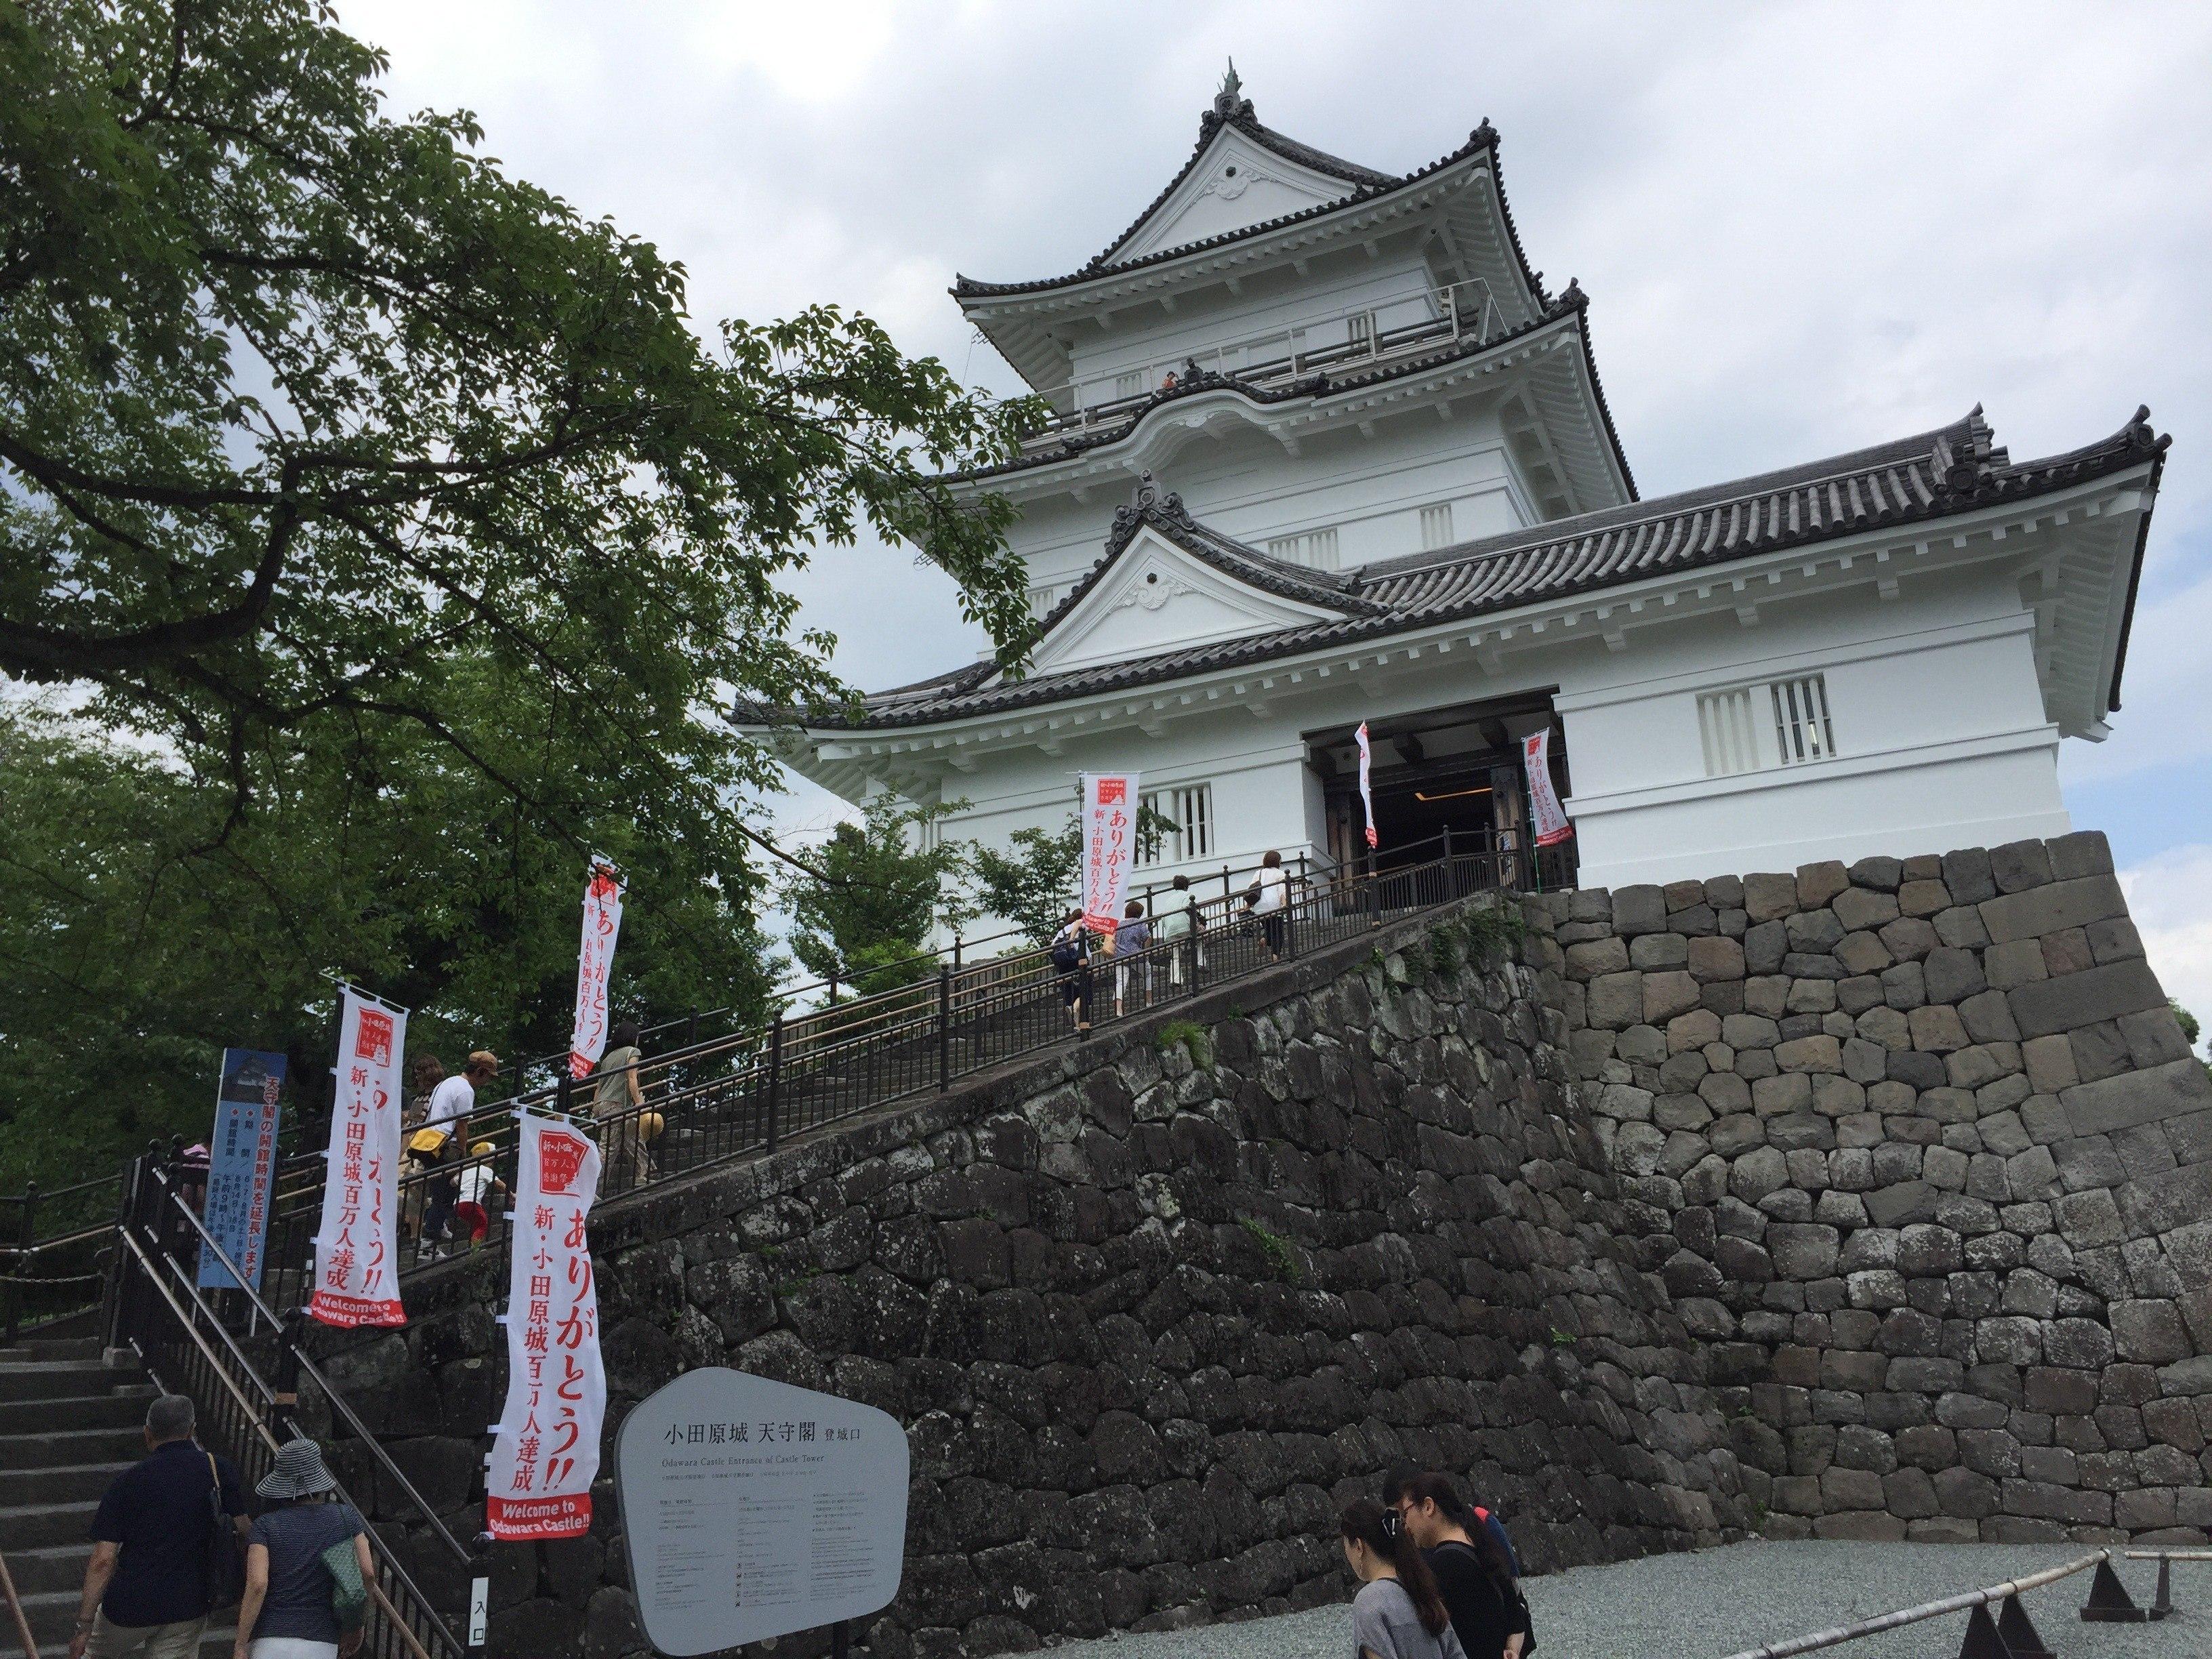 Odawara Castle Museum - Odawara Castle Japan Guide Review Video - 9 Reasons To See Odawara Castle Kanagawa Japan 🇯🇵 🏯 🌸